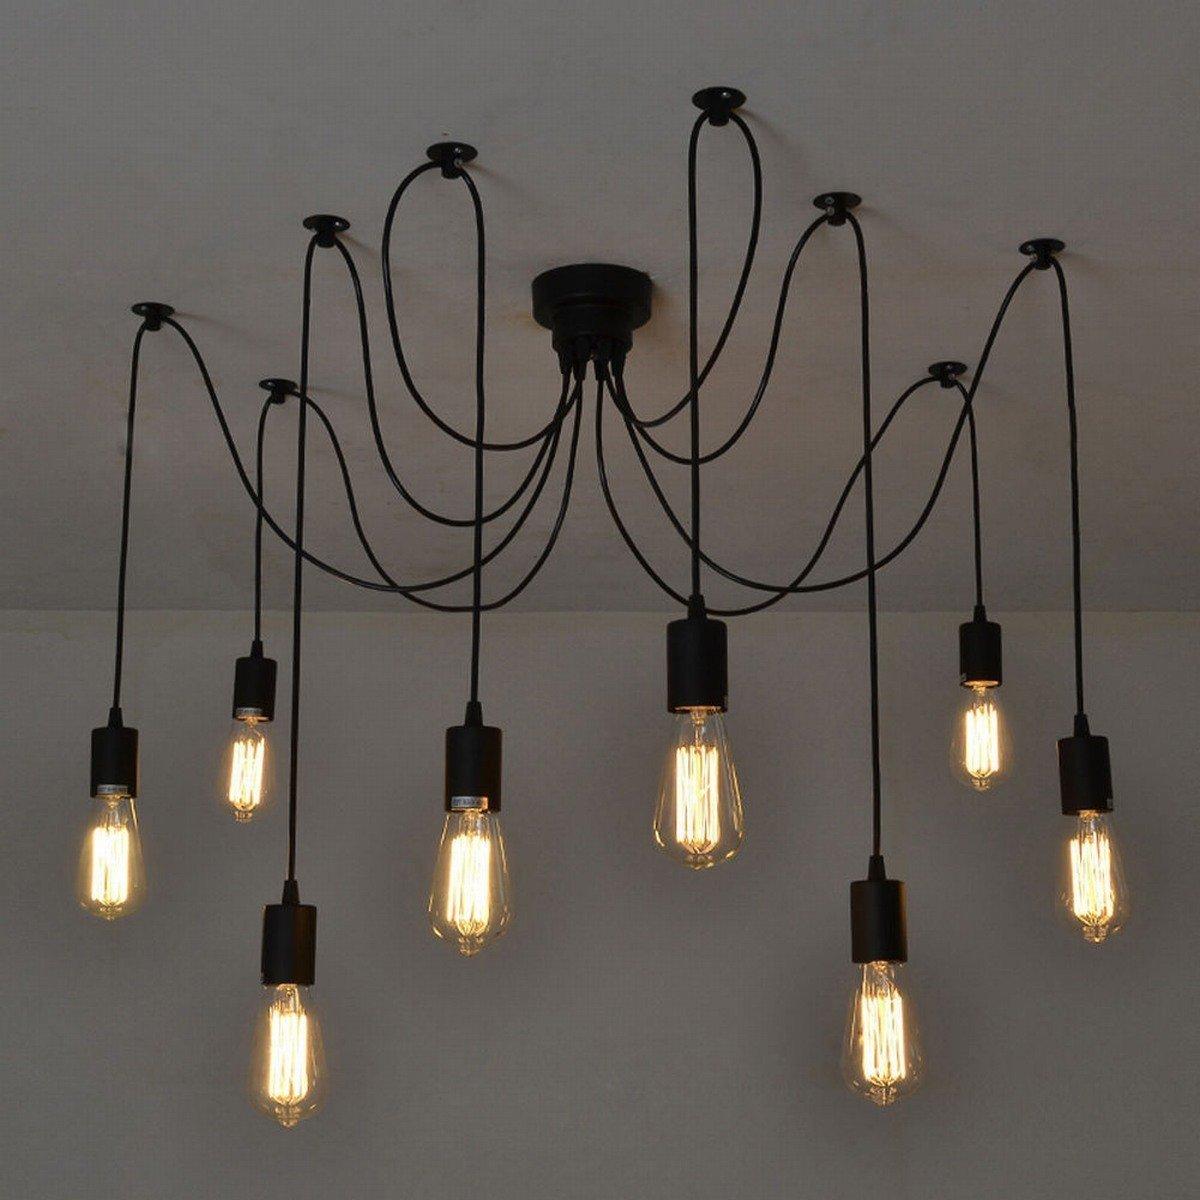 cheap vintage lighting. Itian Chandelier Lights 8 Light Bulbs Interface Antique Vintage Edison Lamp Shade Multiple Adjustable E27 Retro DIY Ceiling Pendant Lighting Hall Deco(8 Cheap T